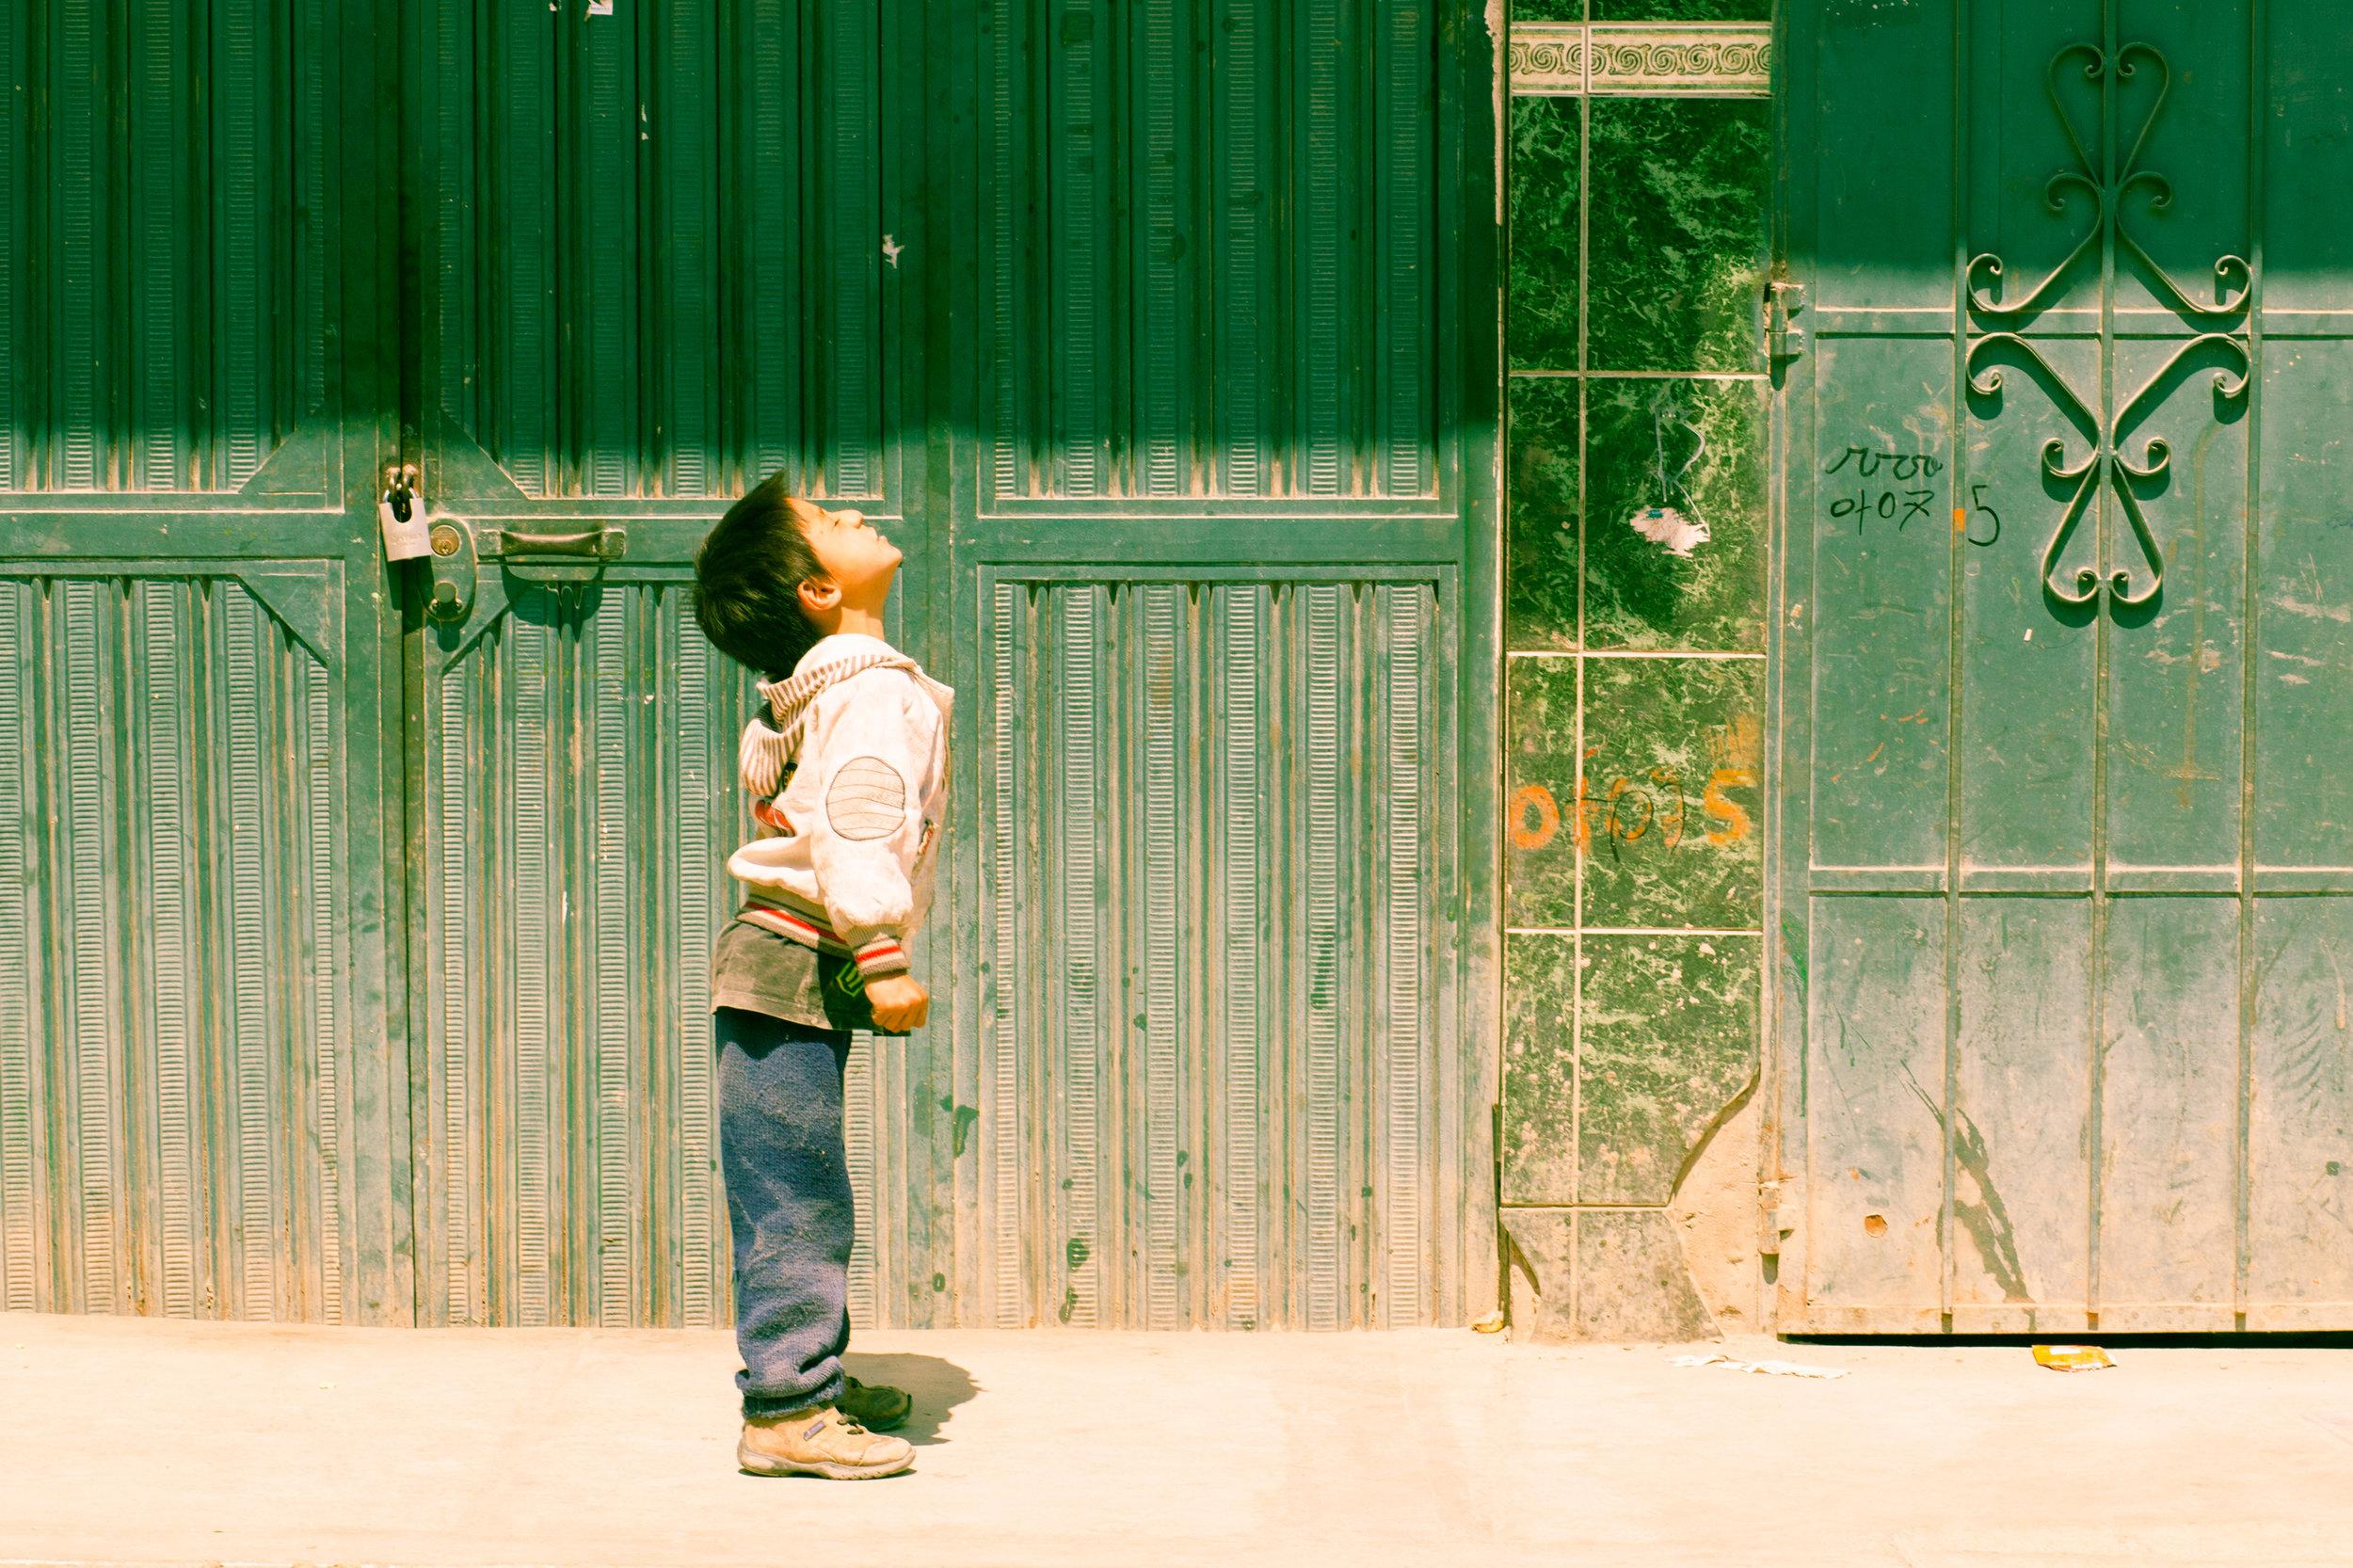 Geraint Rowland Photography: Street Portrait in Peru.